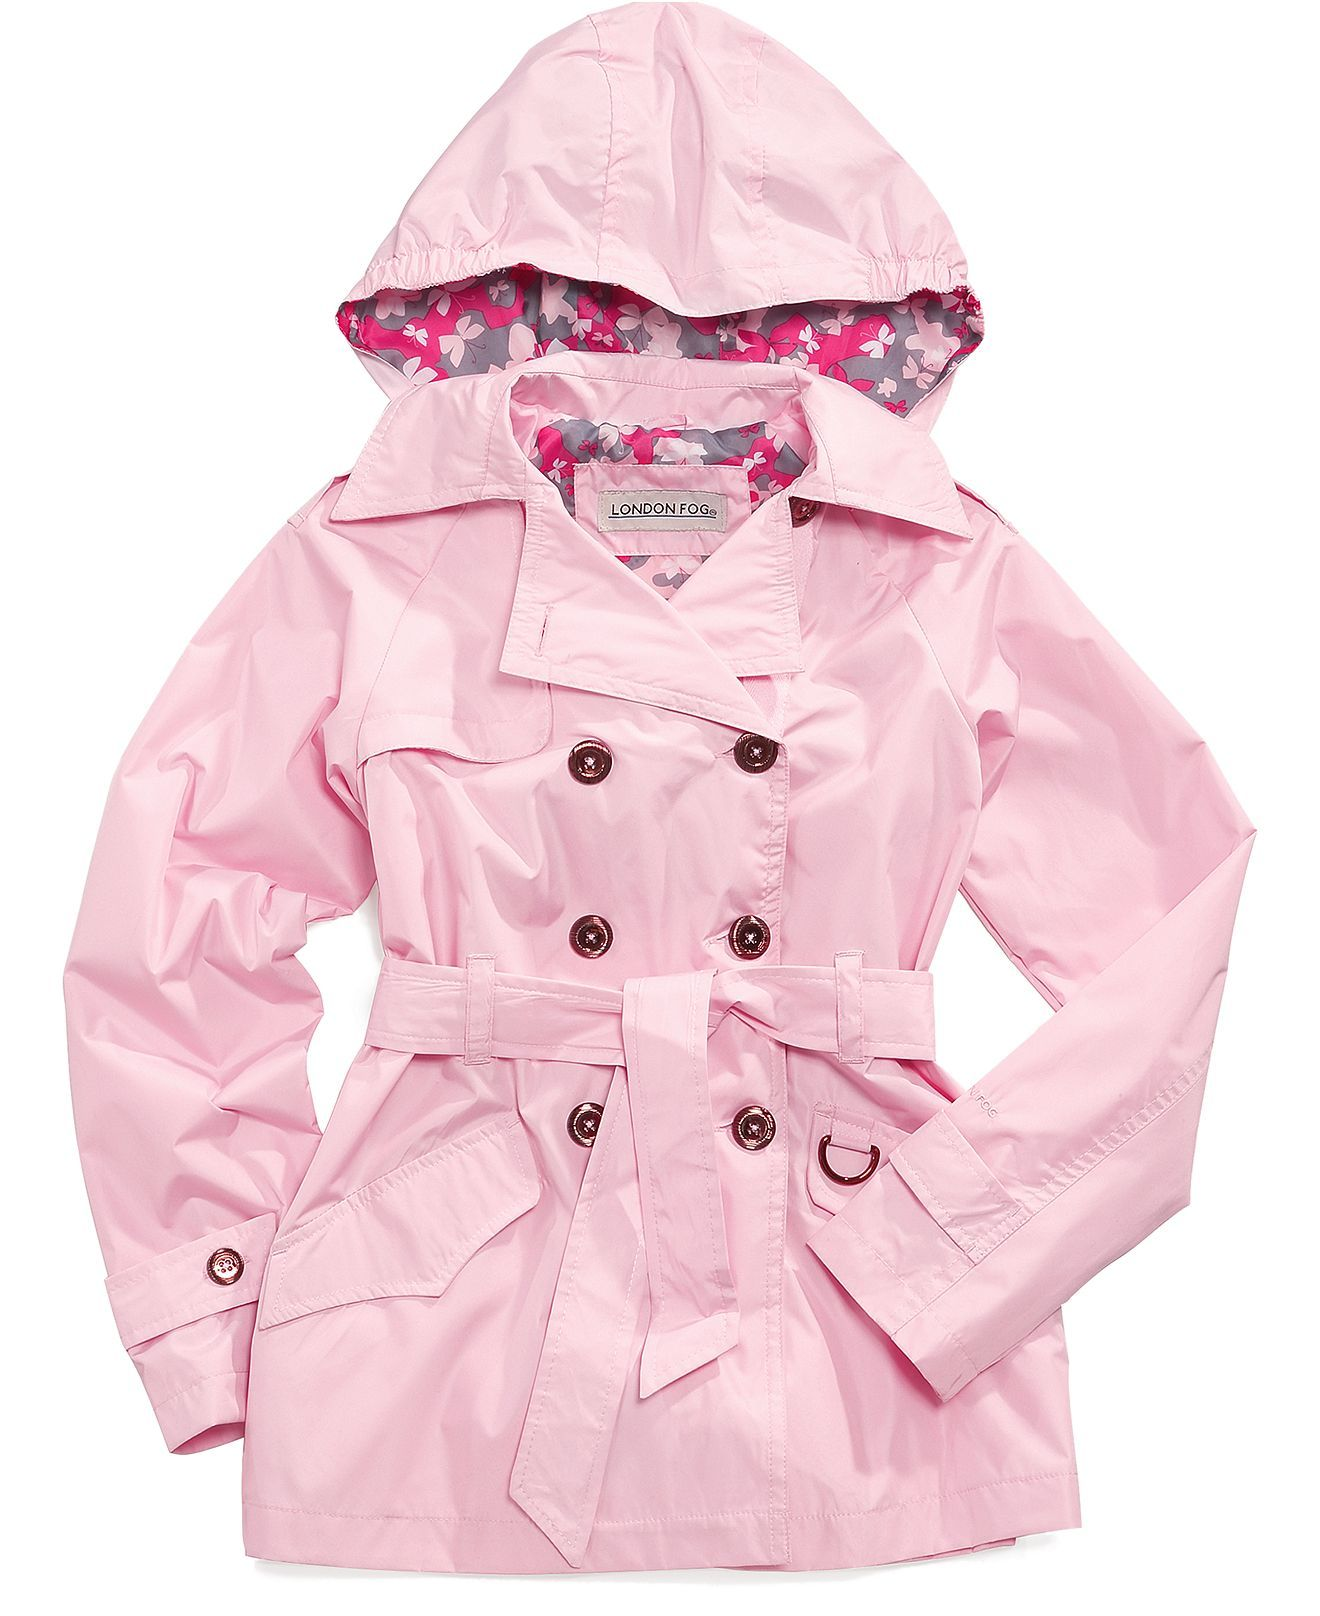 London Fog Kids Jacket Girls Belted Trench Coat Kids Macy s